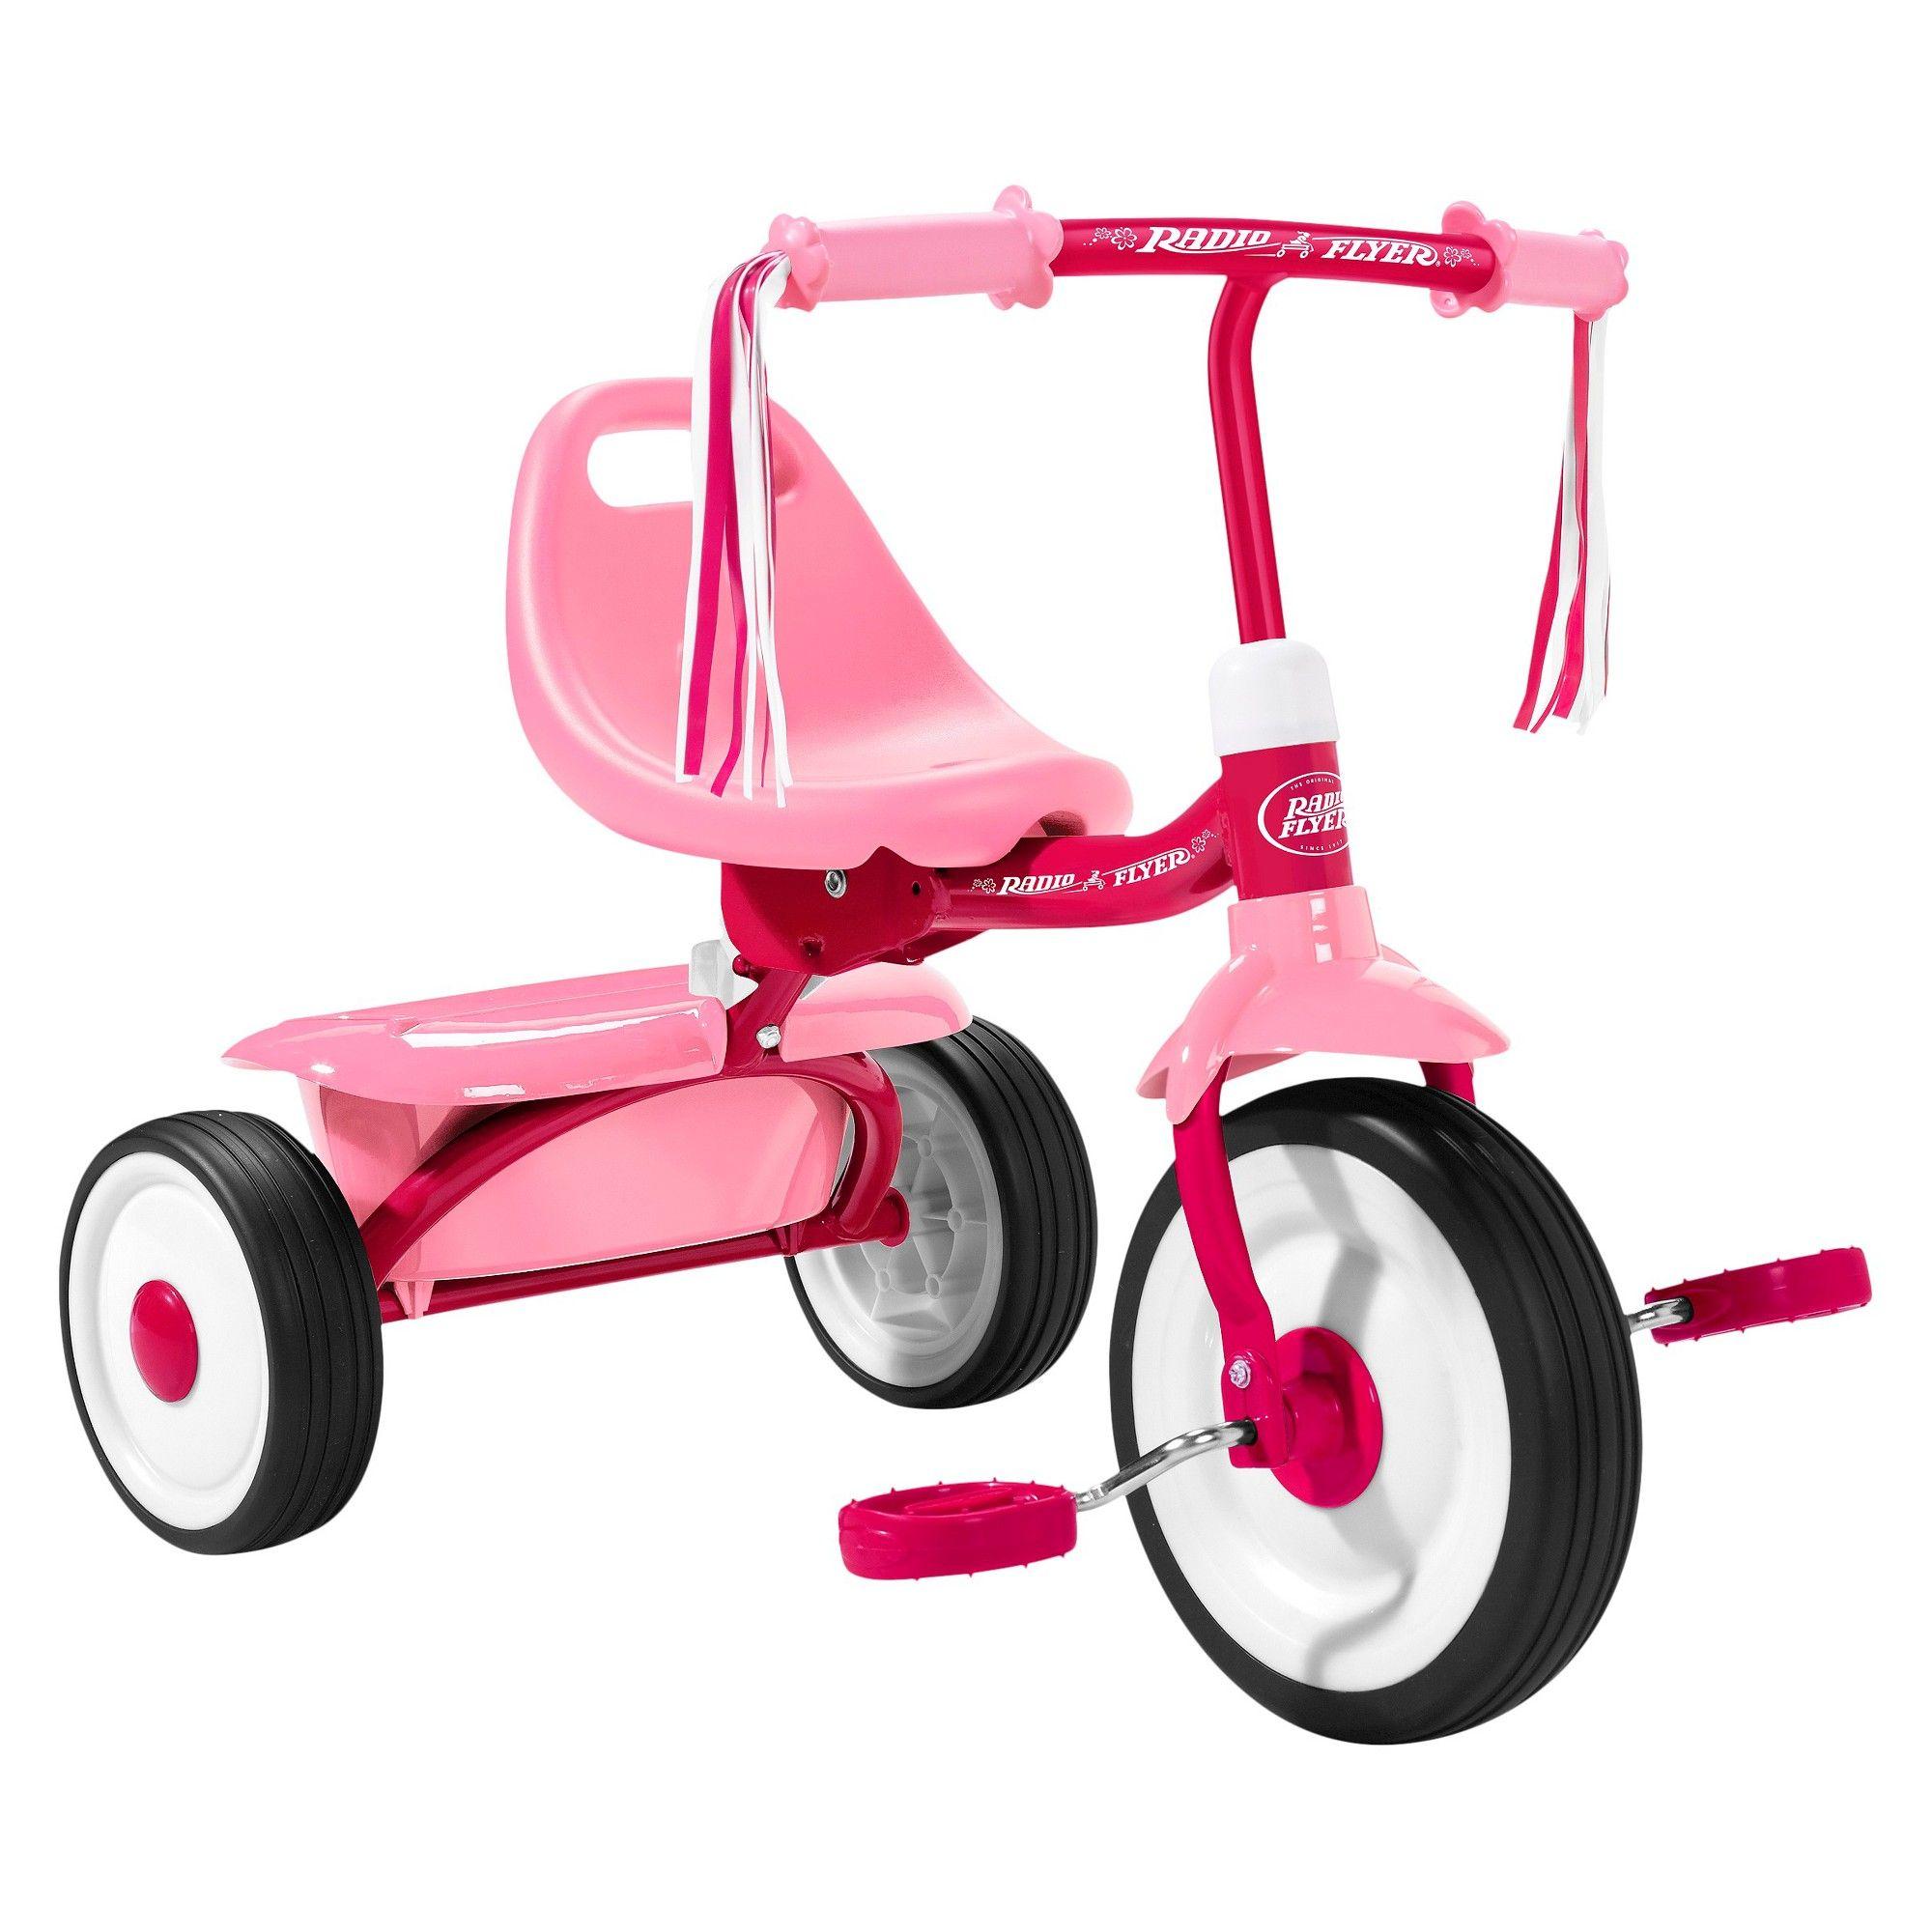 Radio Flyer Fold 2 Go Trike Pink, MultiColored